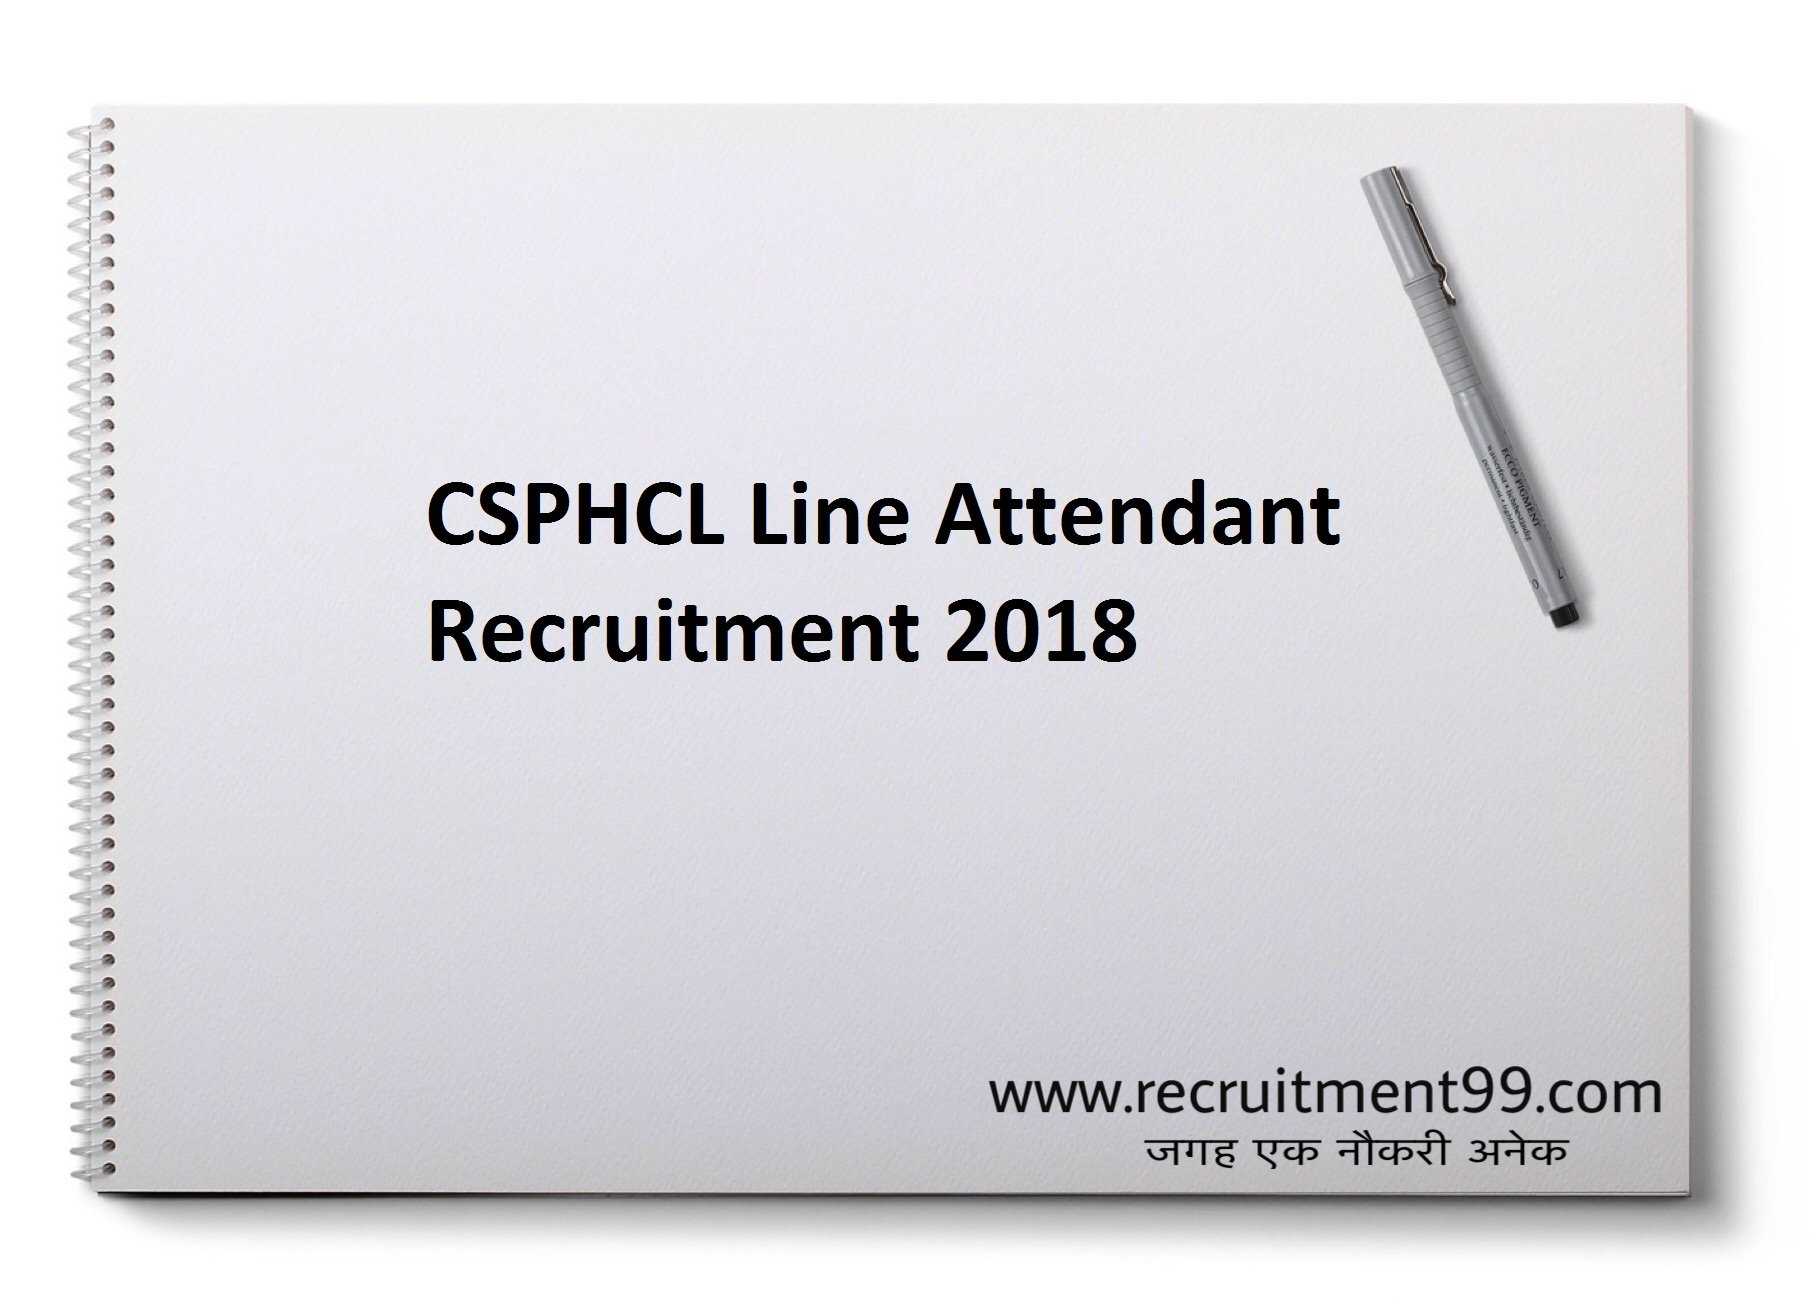 CSPHCL Line Attendant Recruitment Admit Card Result 2018